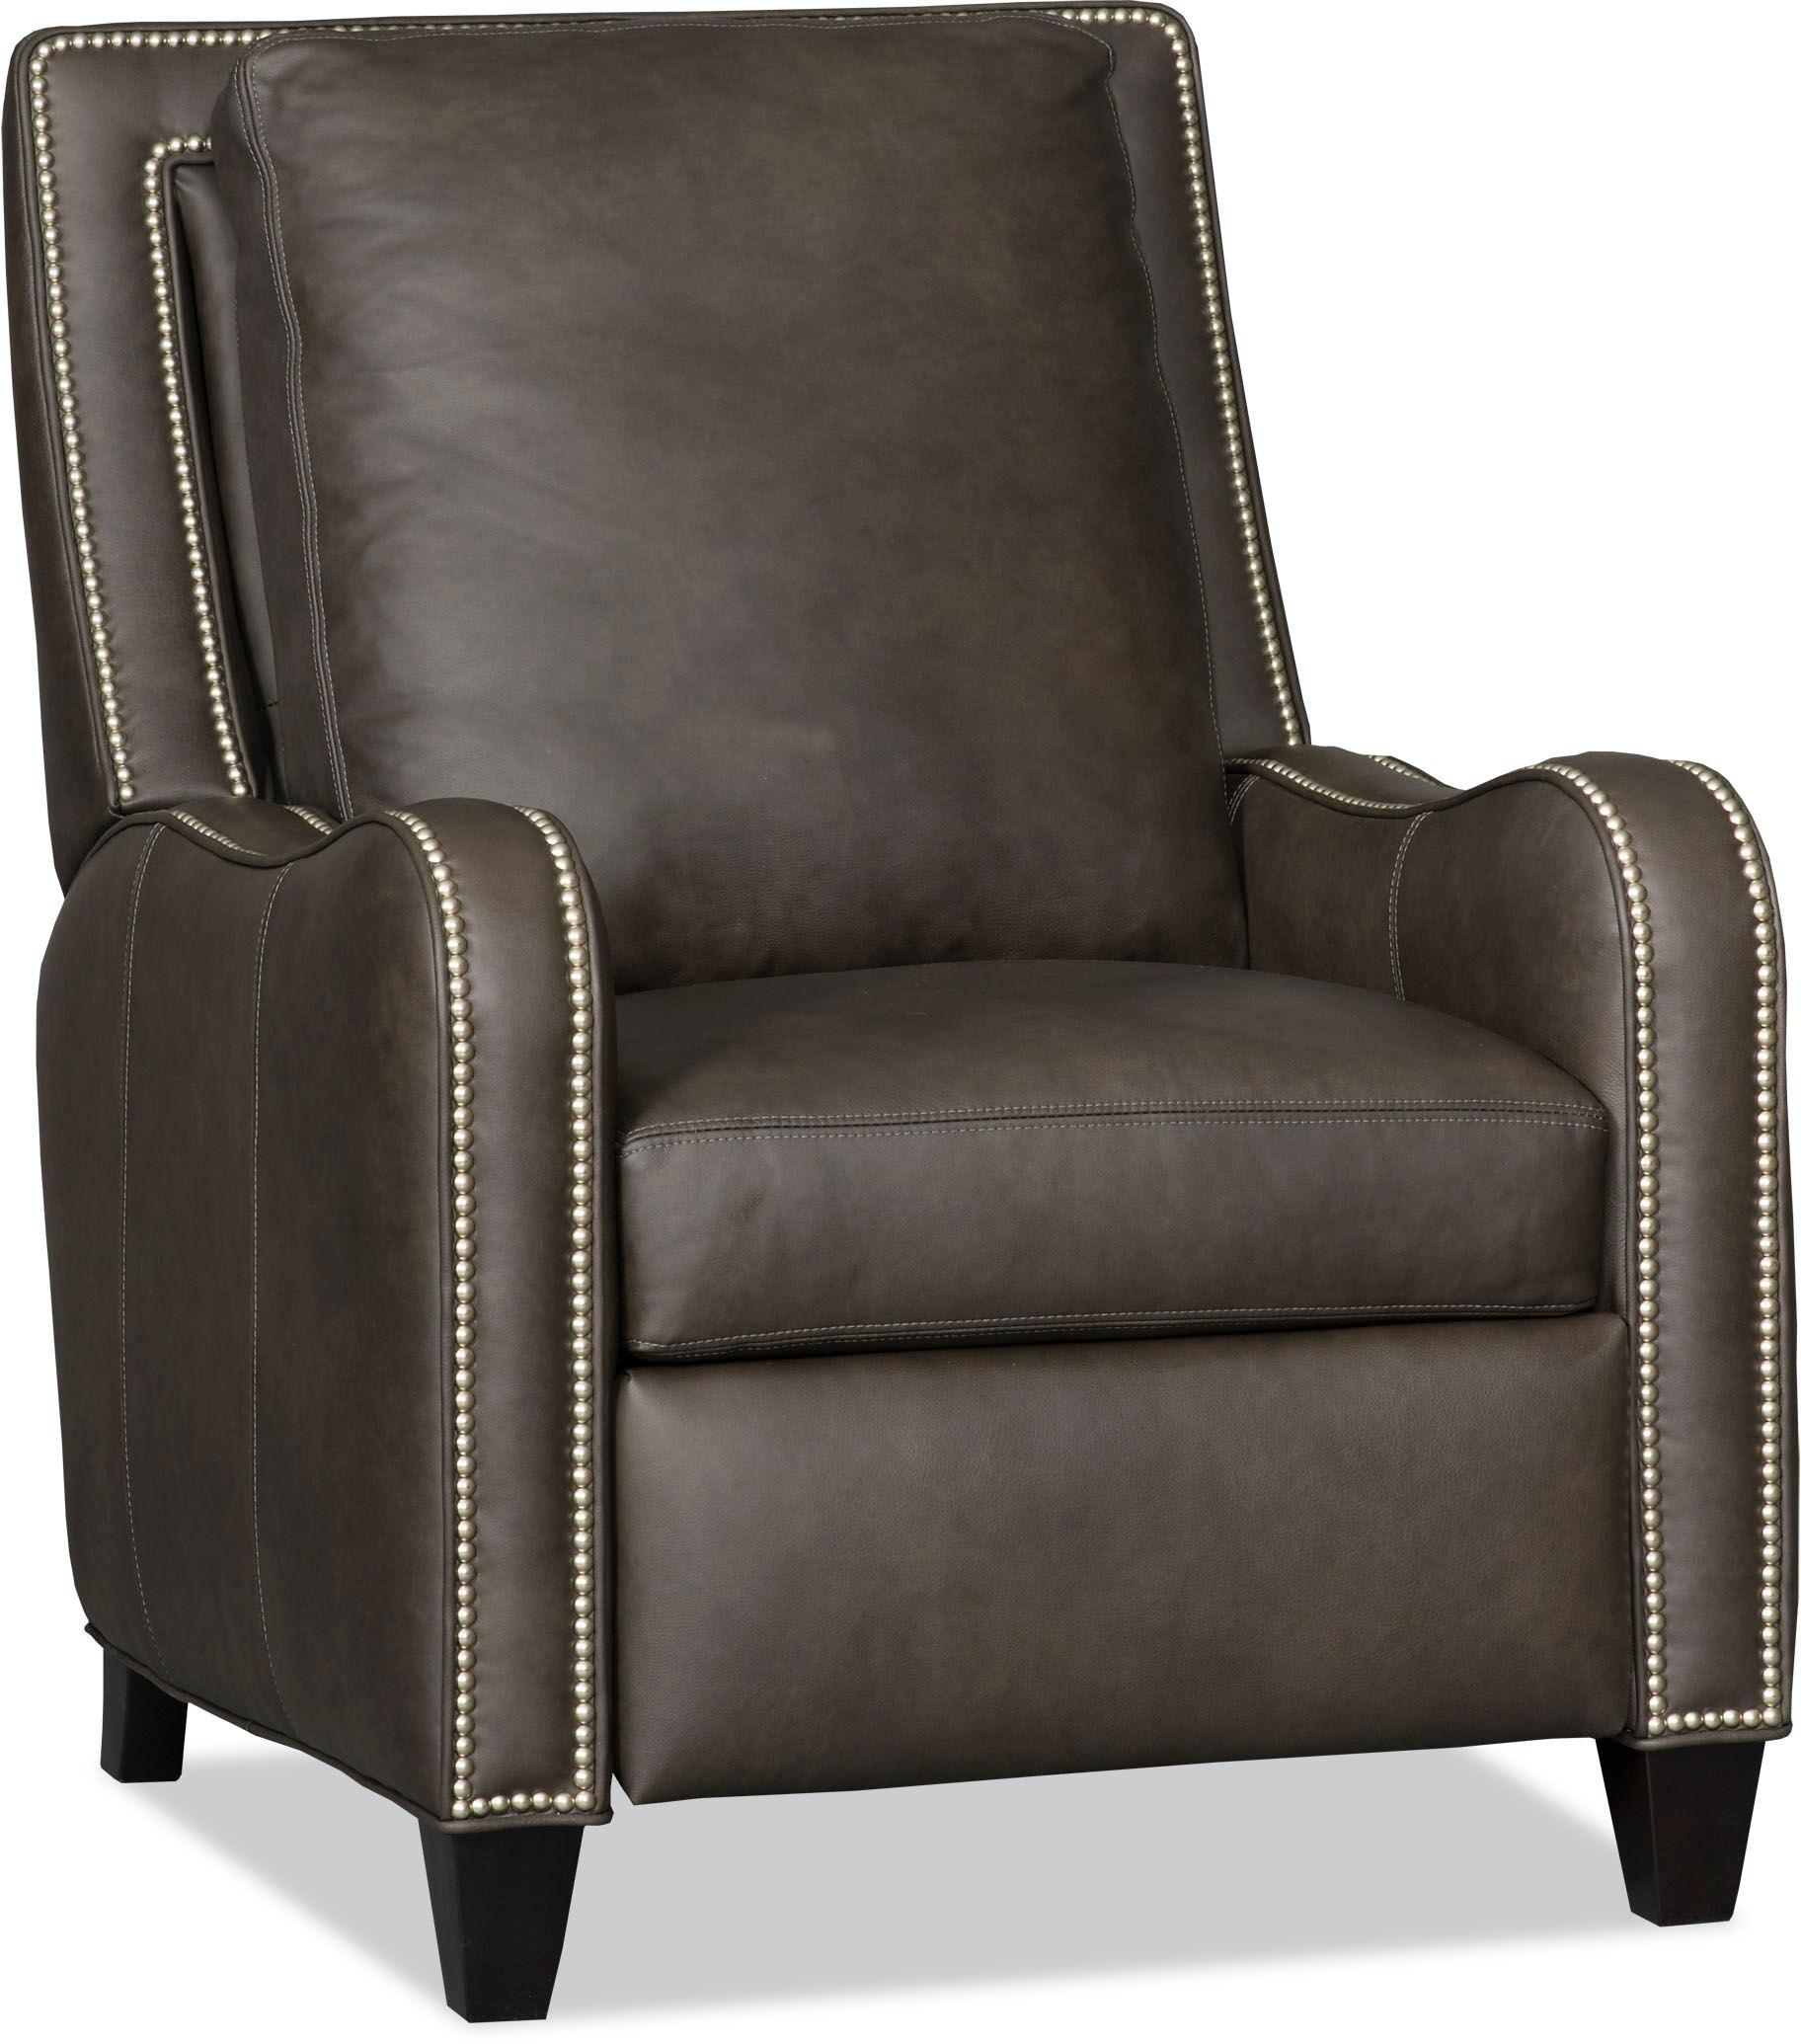 Bradington Young Furniture 3613 Bradington Young Living Room Greco Reclining Chair